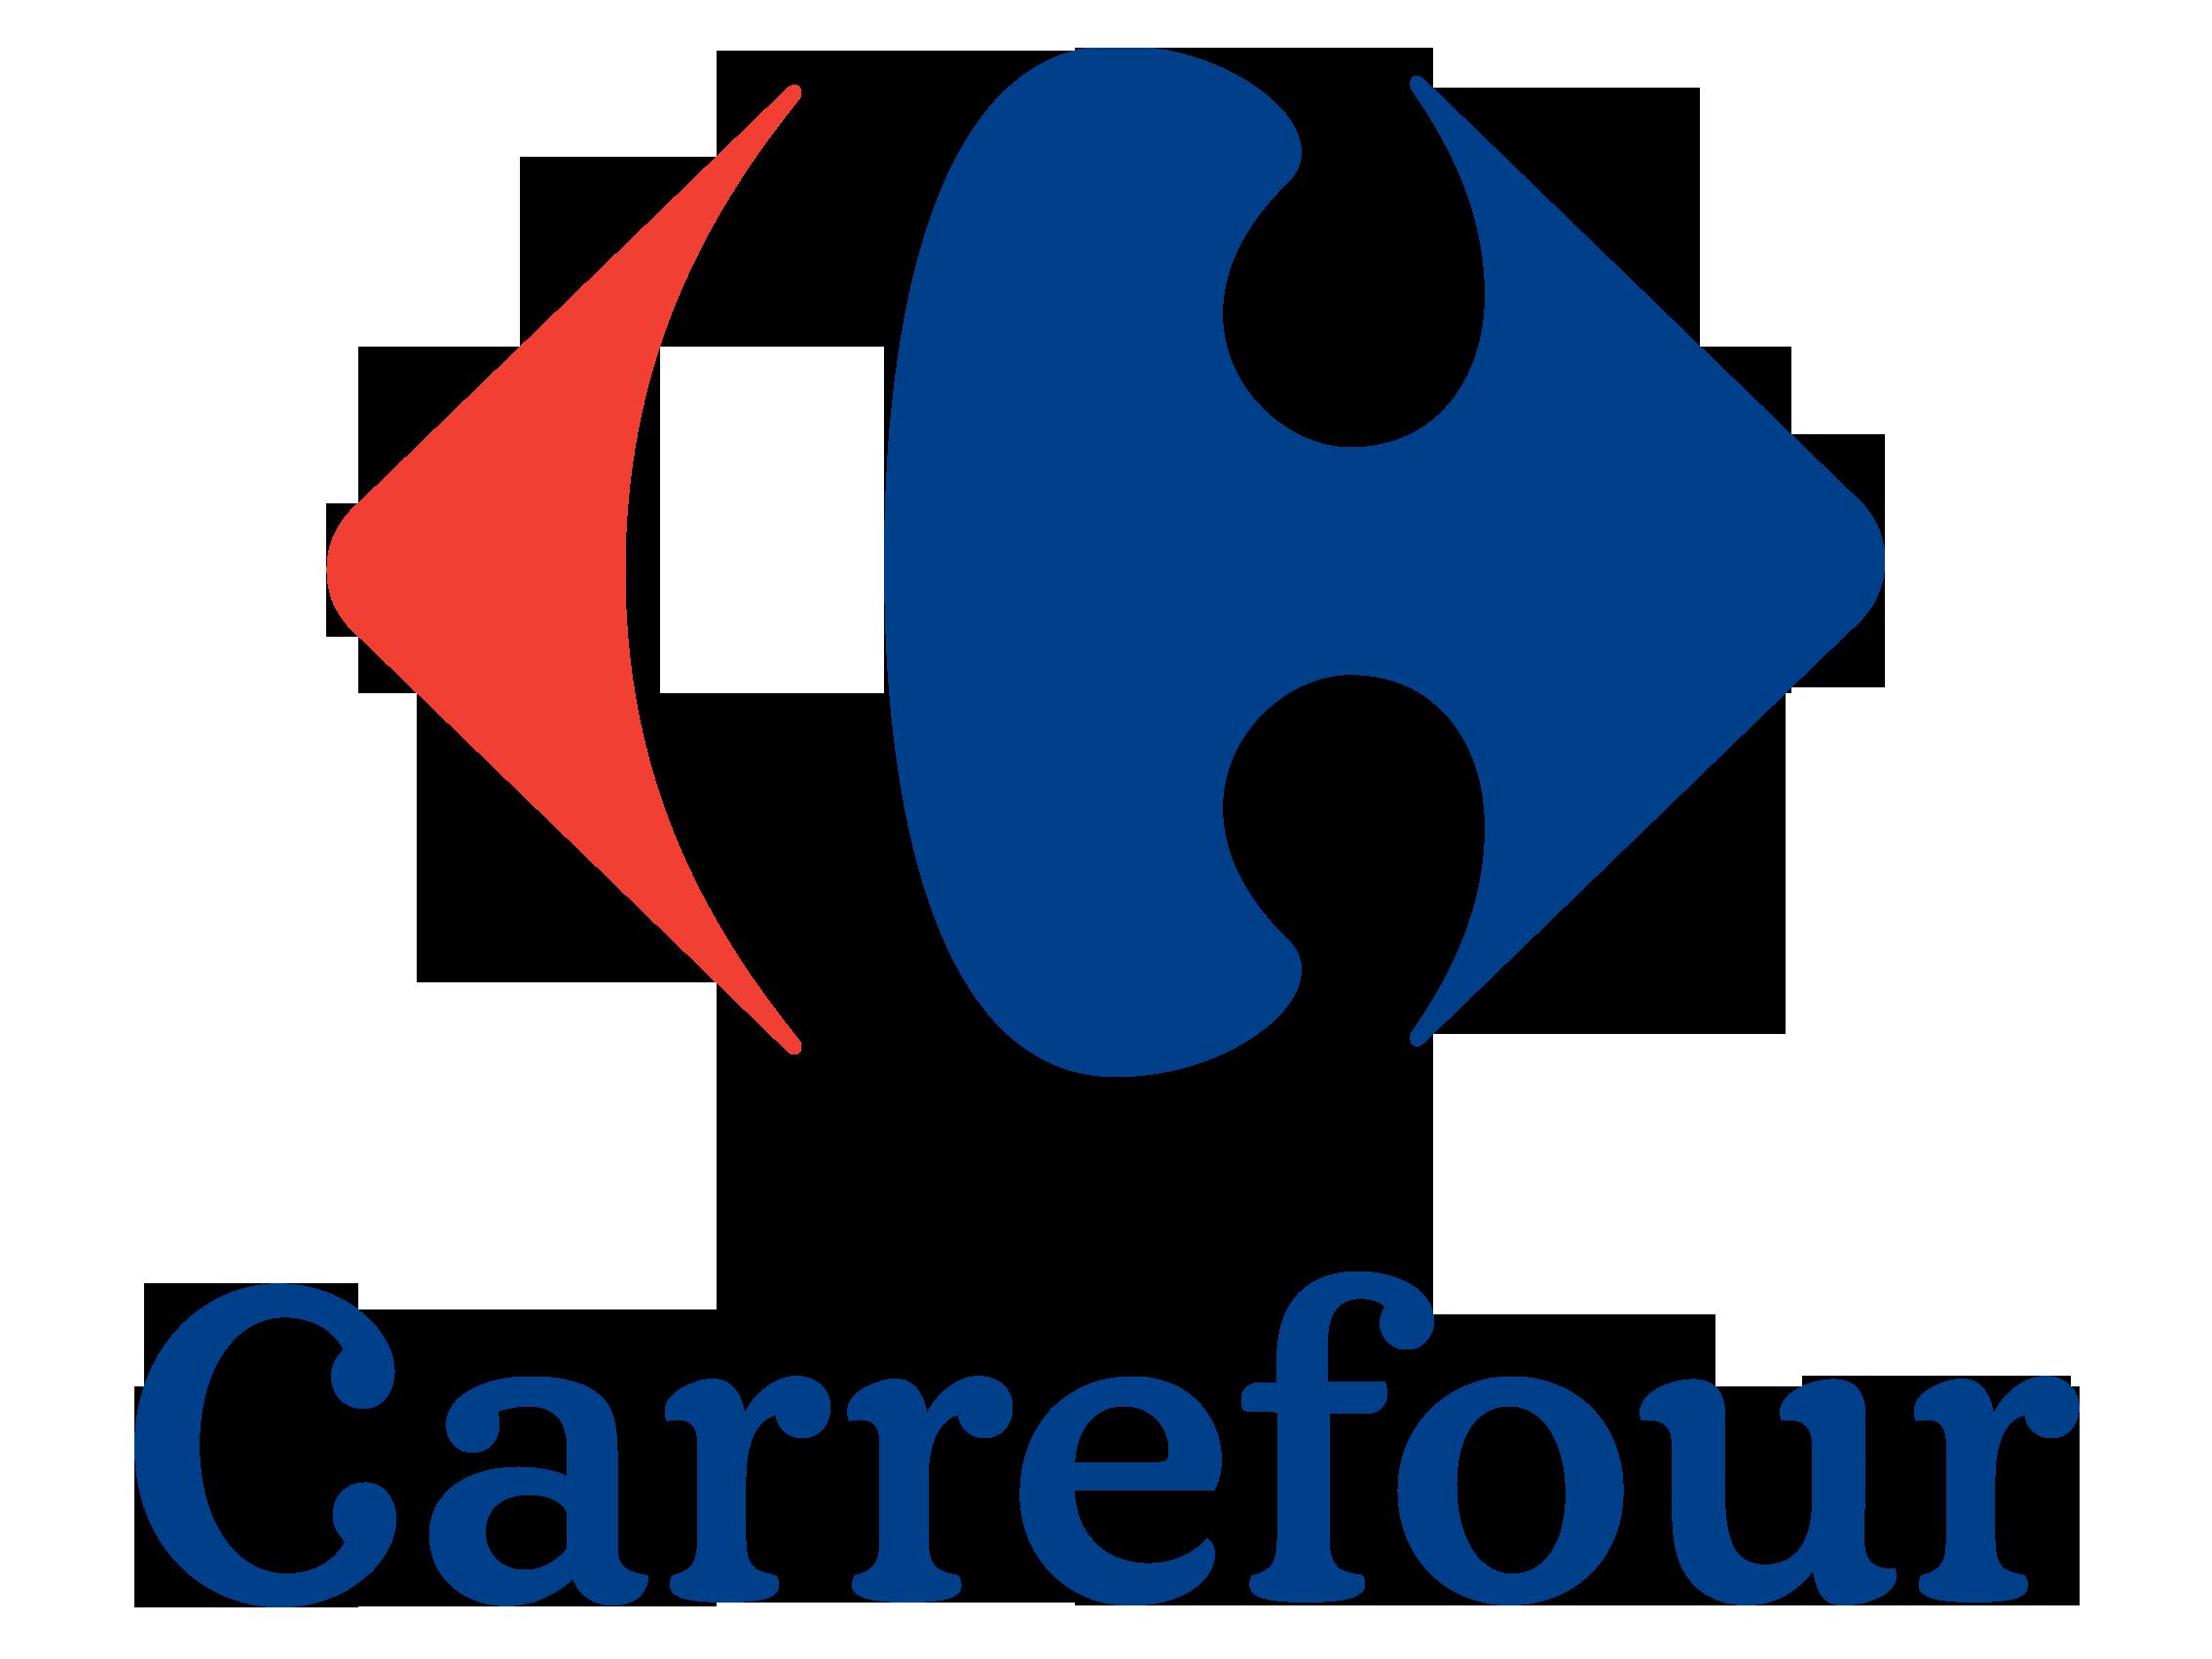 Carrefour Logo Wallpaper